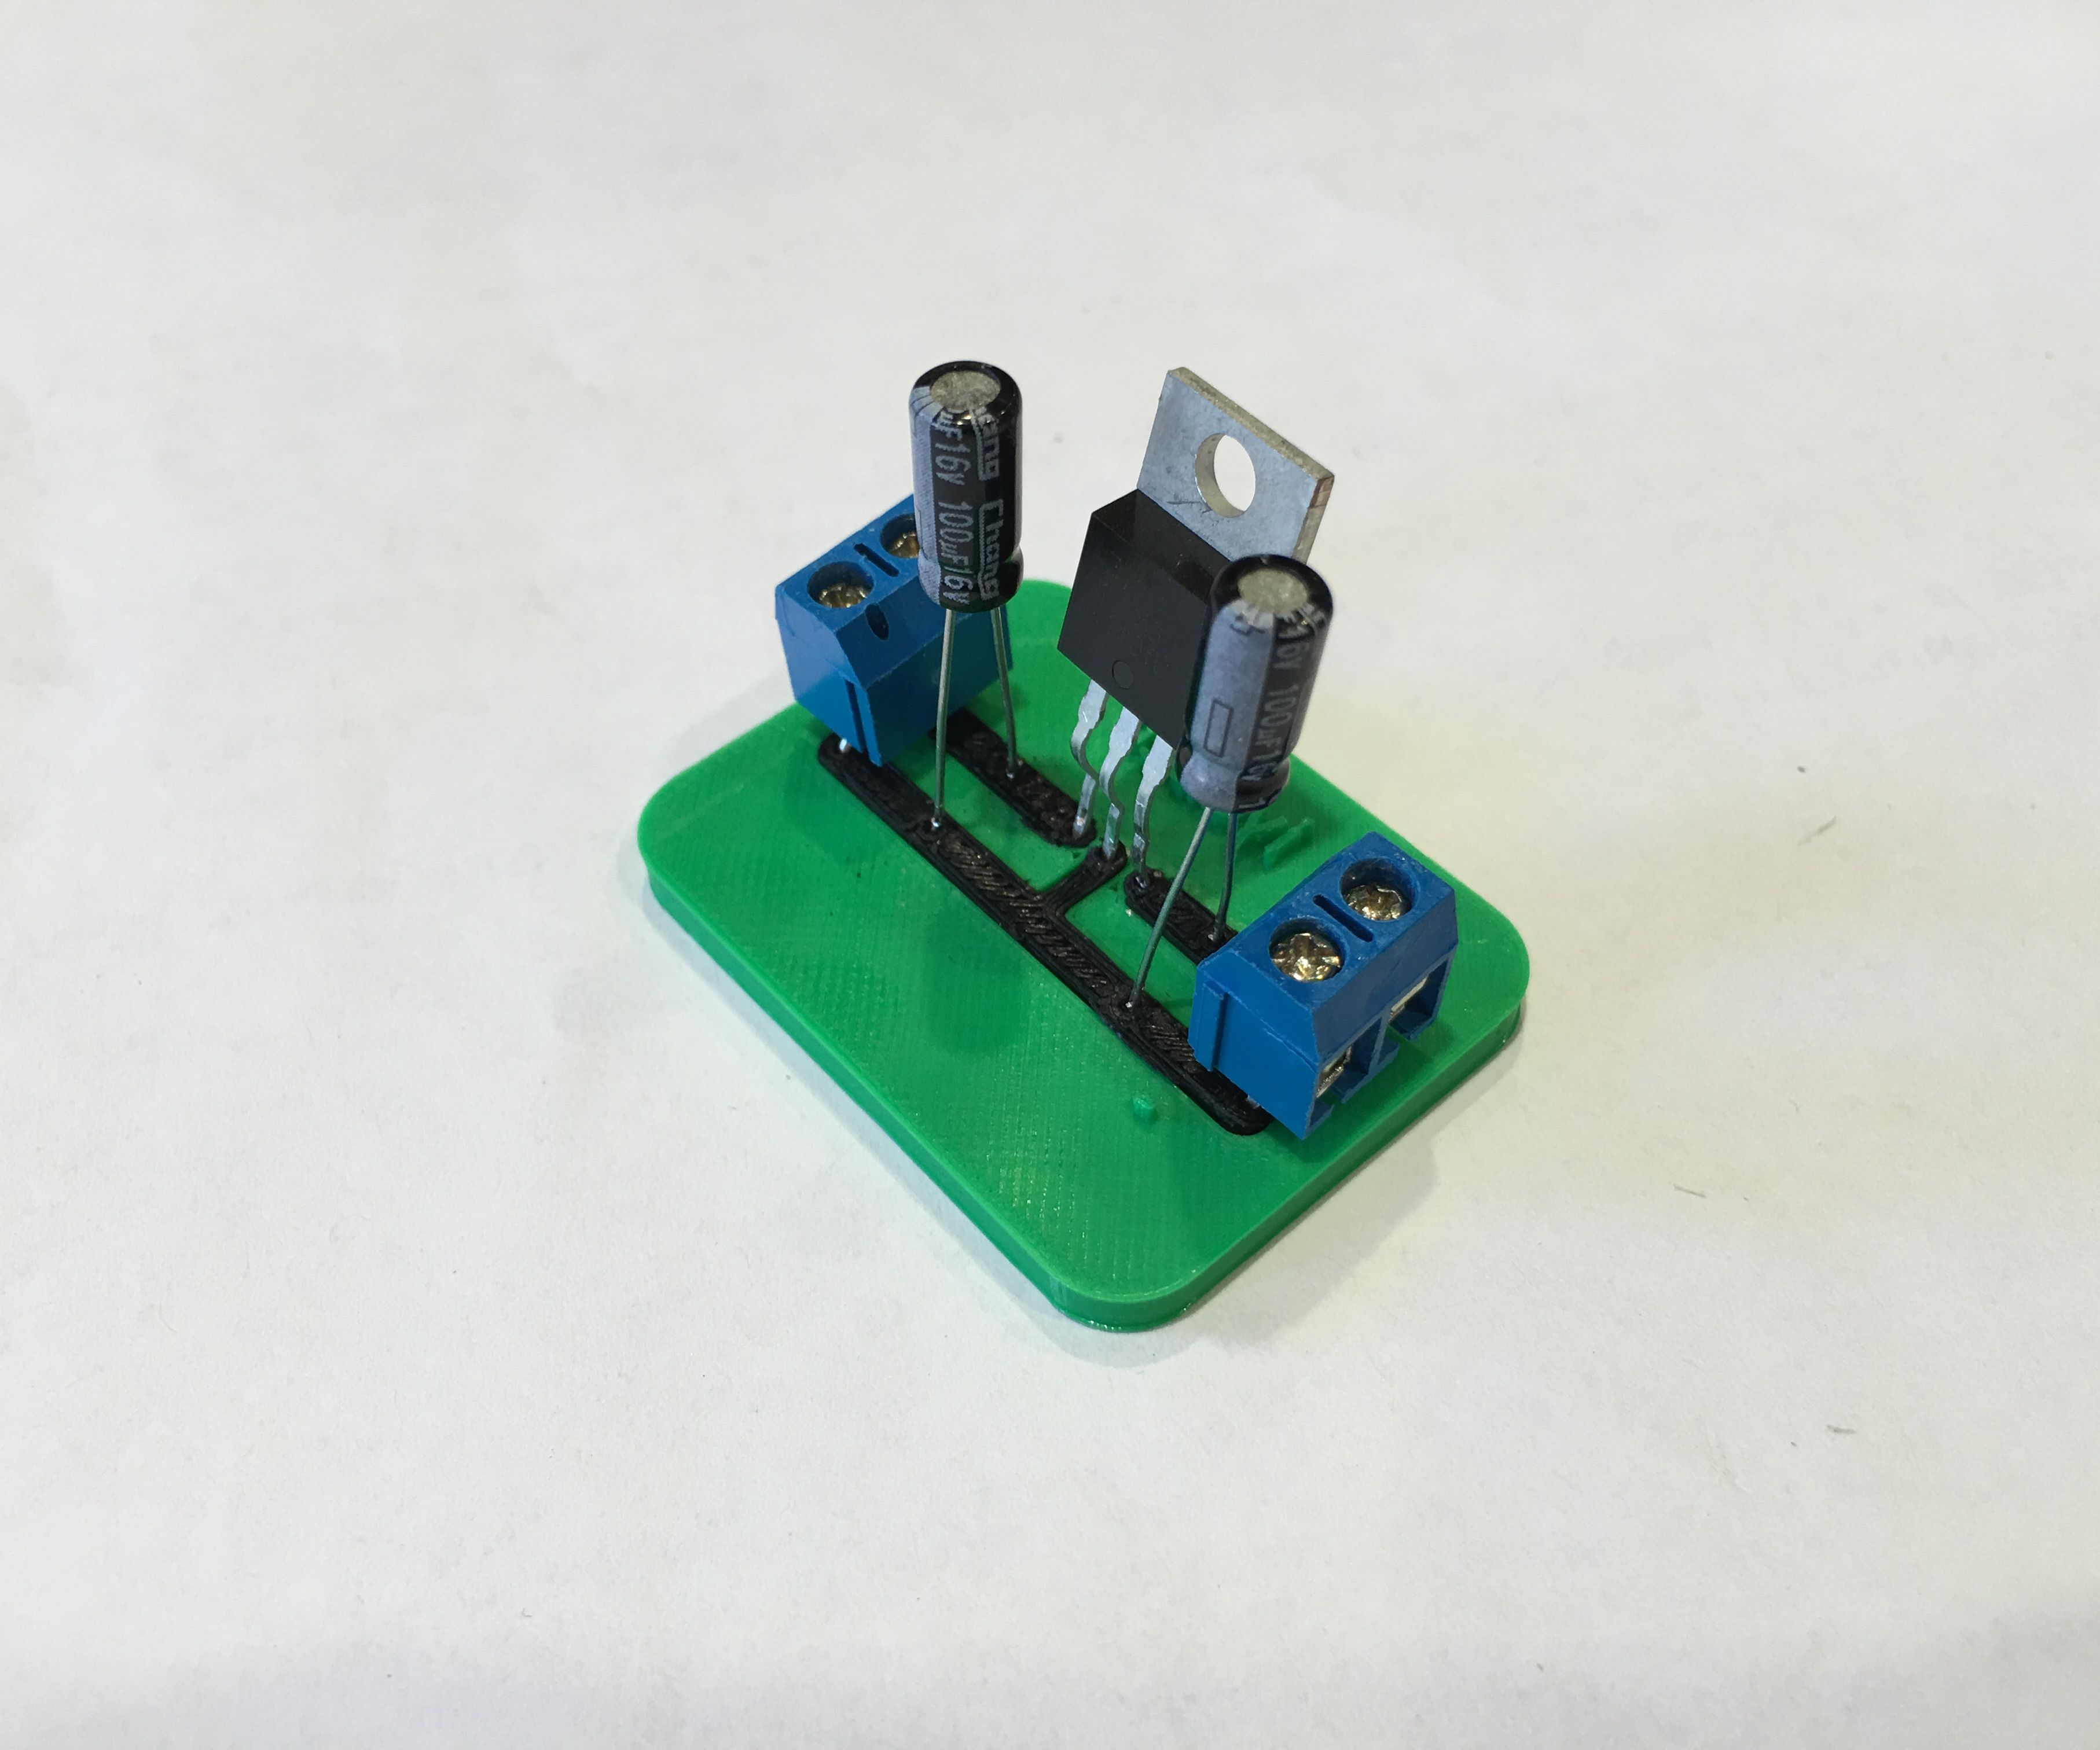 3D Printed Voltage Regulator Circuit like PCB